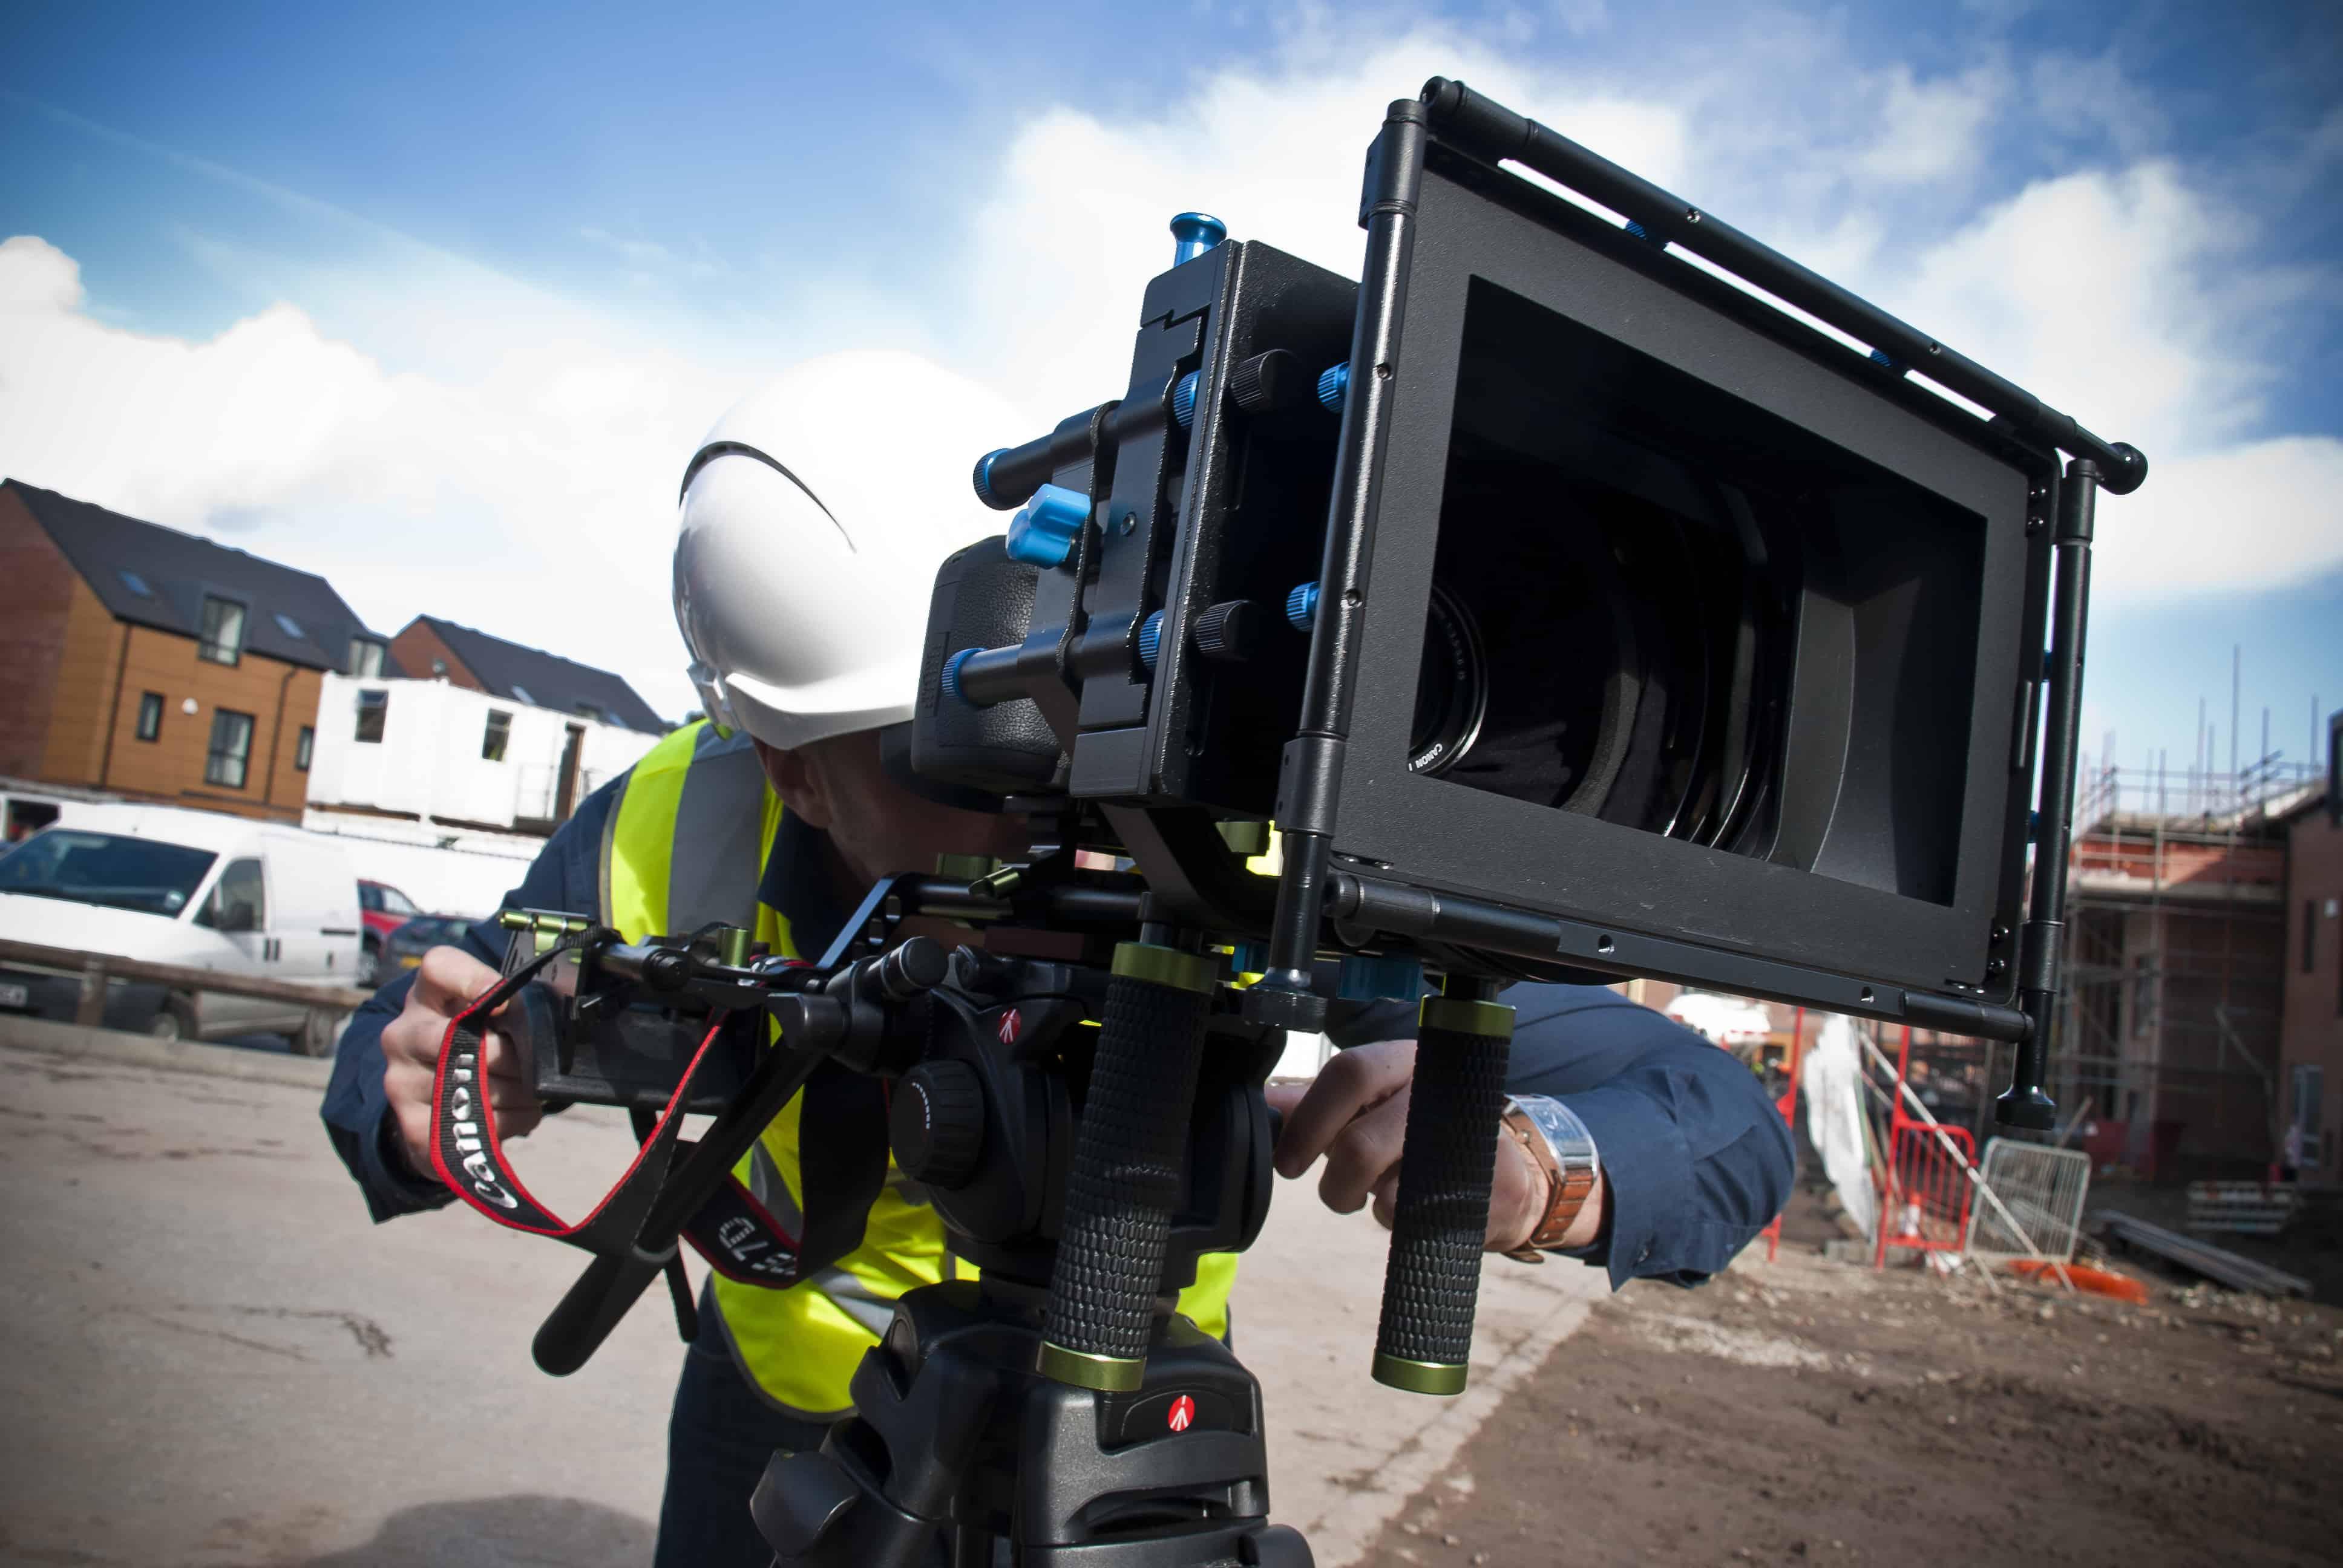 marketing agency liverpool - camera